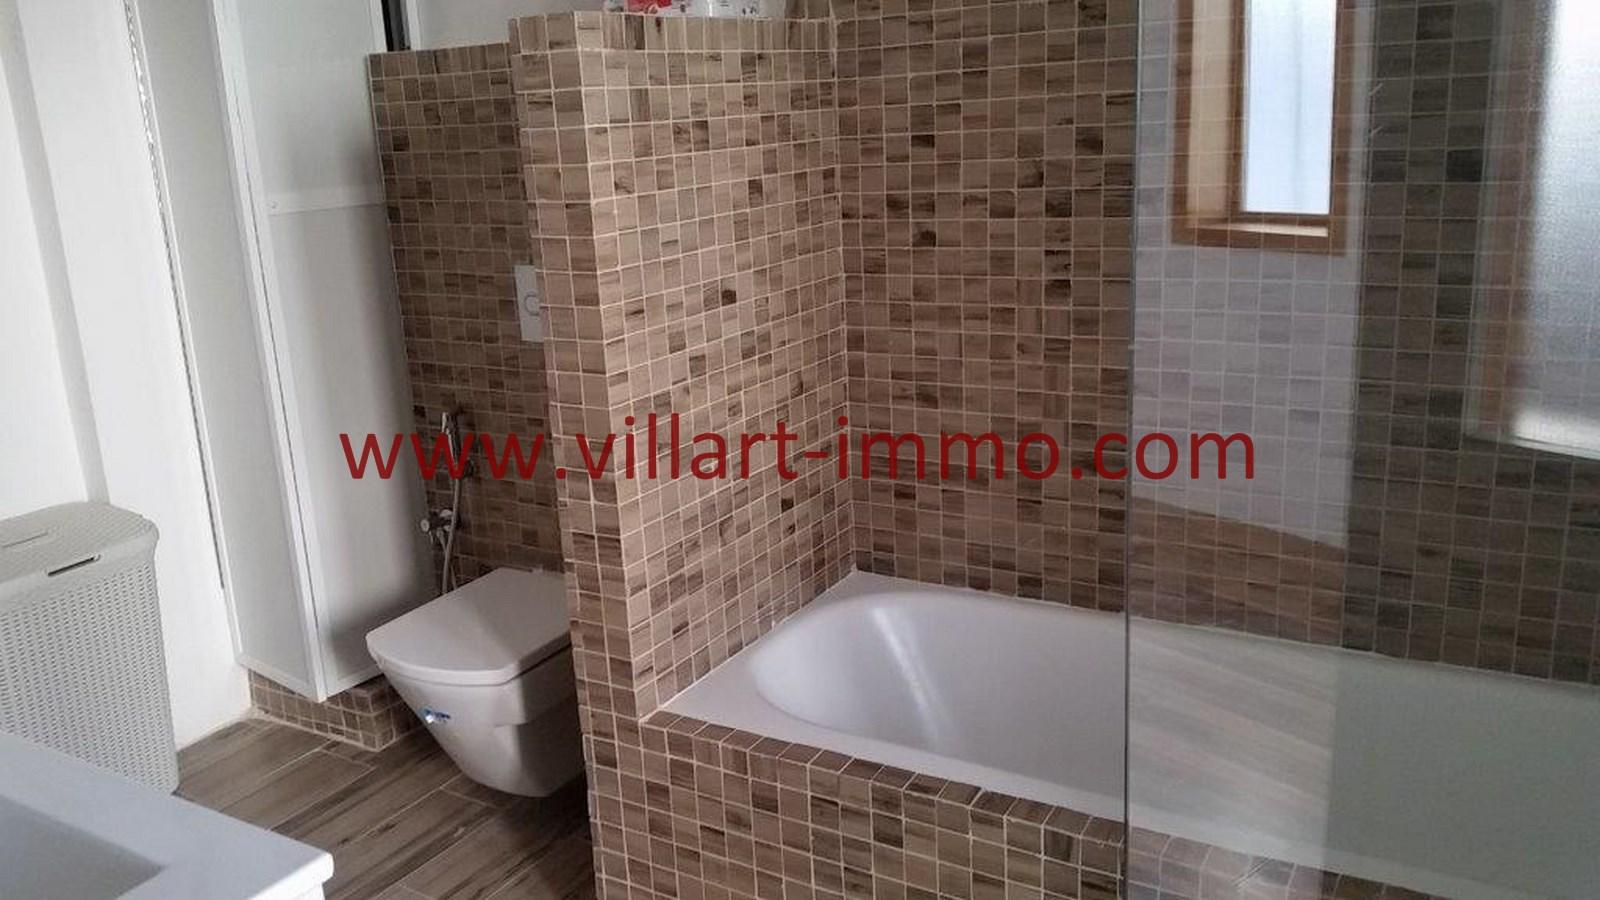 14-Vente-Appartement-Tanger-Centre-De-Ville-Salle de bain 1-VA518-Villart Immo